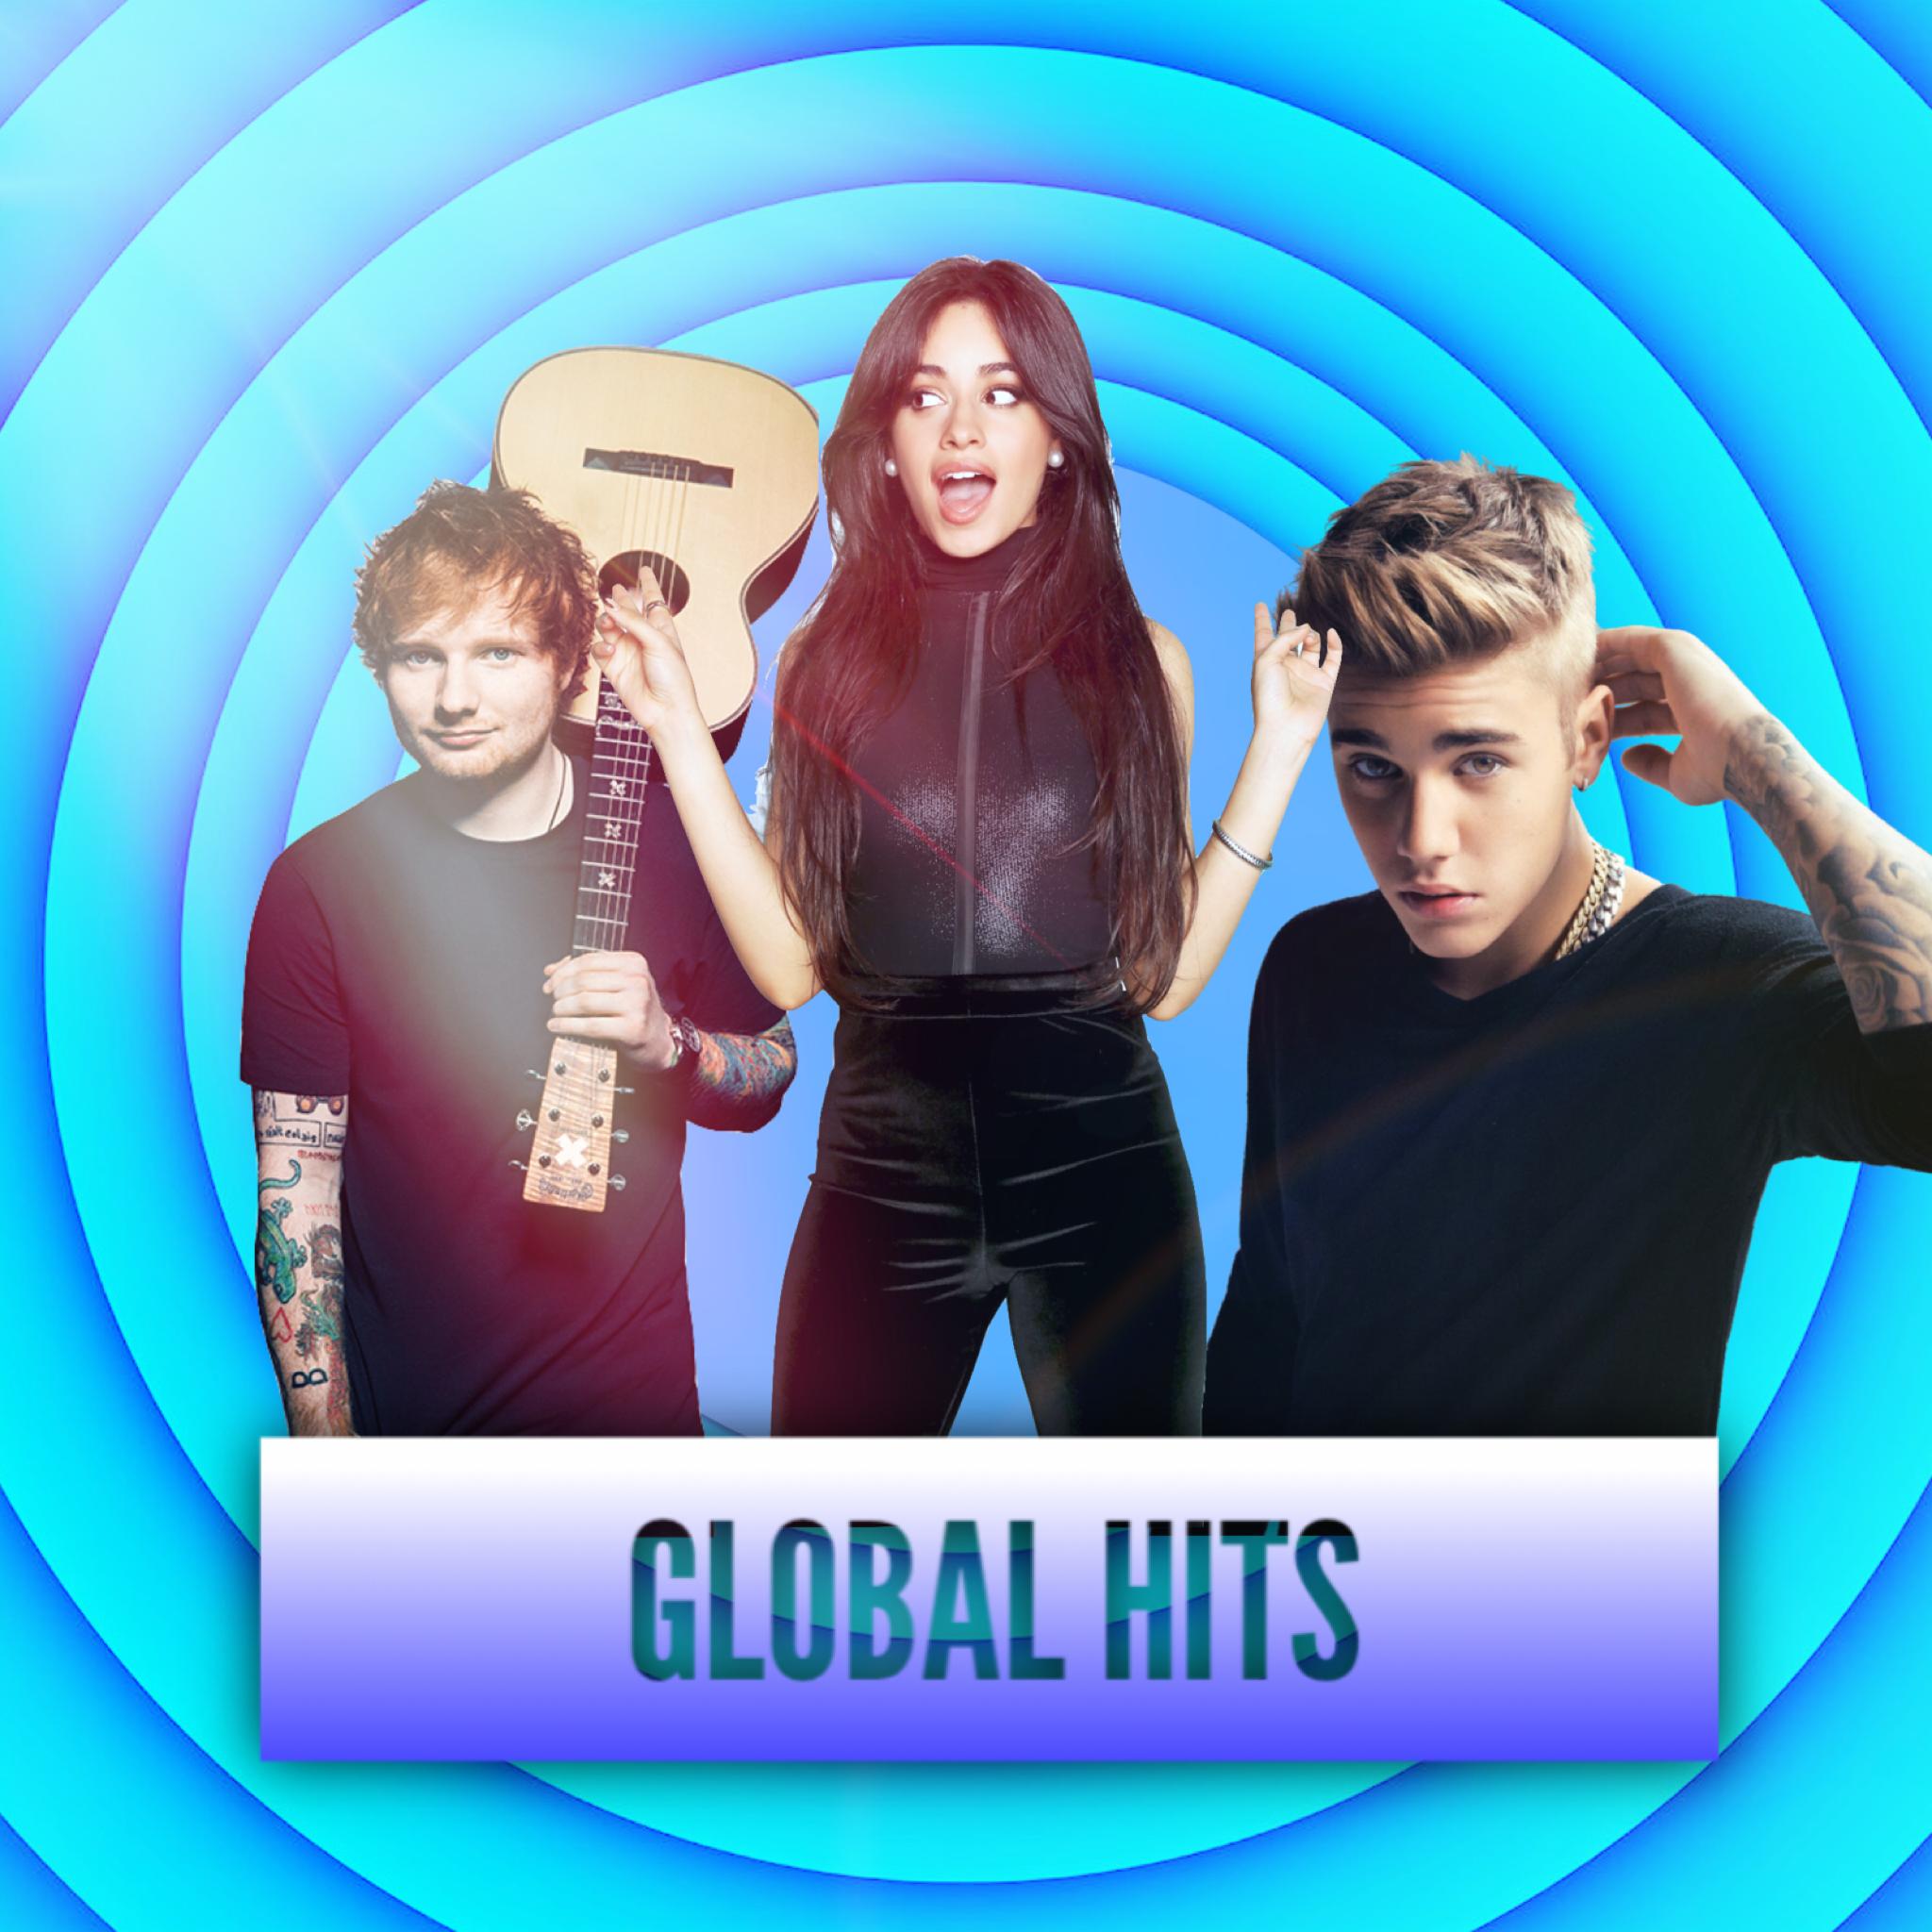 Global Hits 2020 Trending Top 100 Hits Todays Hits 2020 Itunes Viral Hits Dance Hits Playlist Top Hits Hit Chart